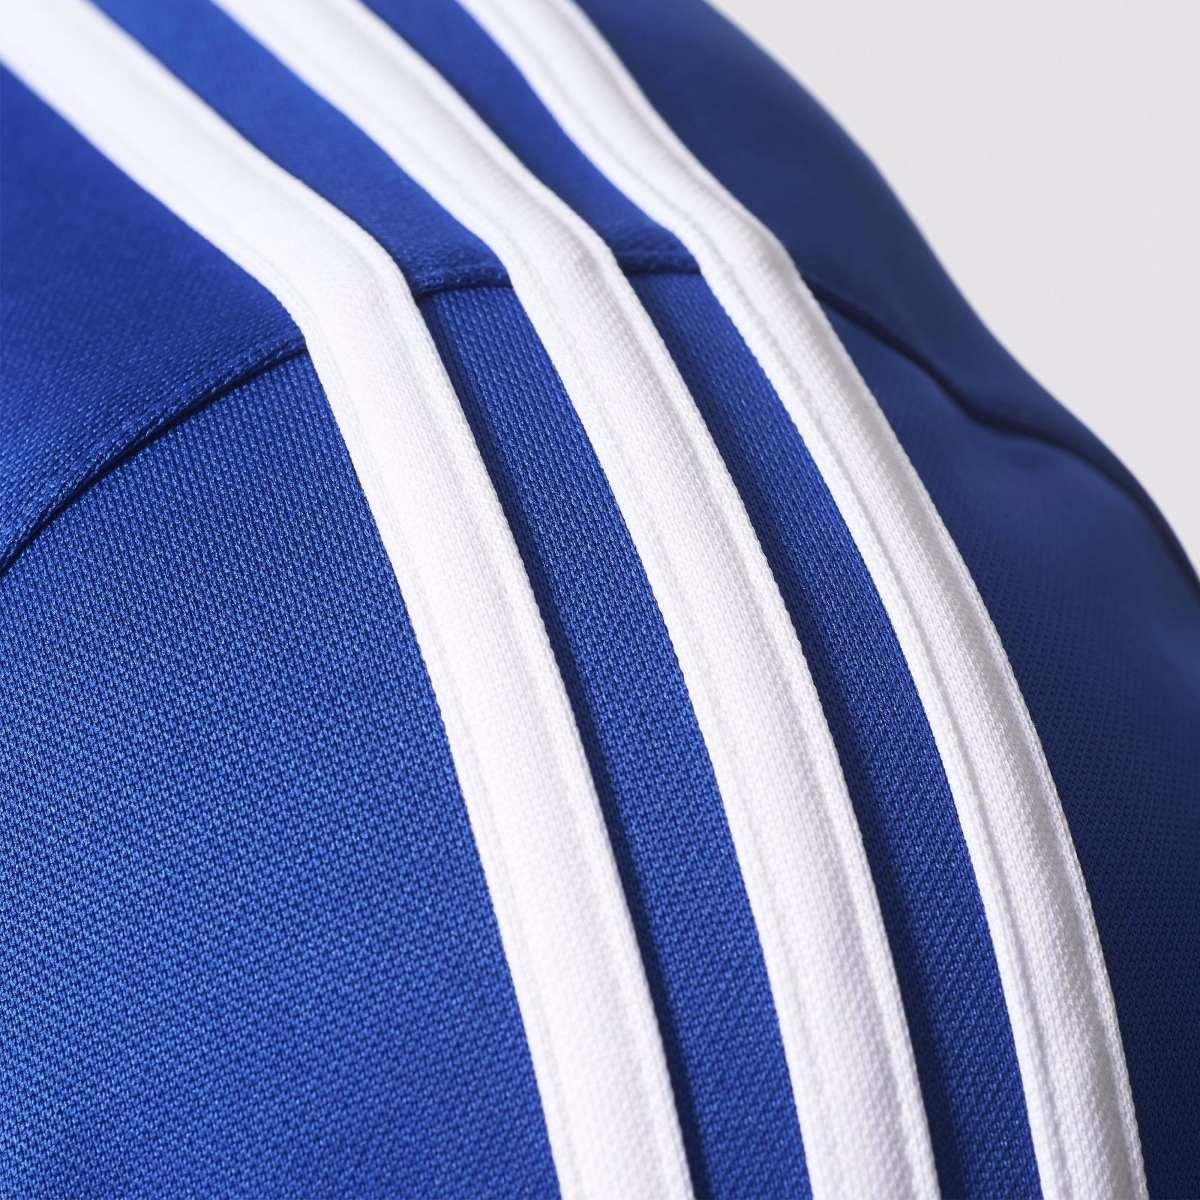 189 Hino Jaqueta Adidas Chelsea Blusa Masc Abrigo R 90 Oficial 6wxvzqsc BqPwYzX